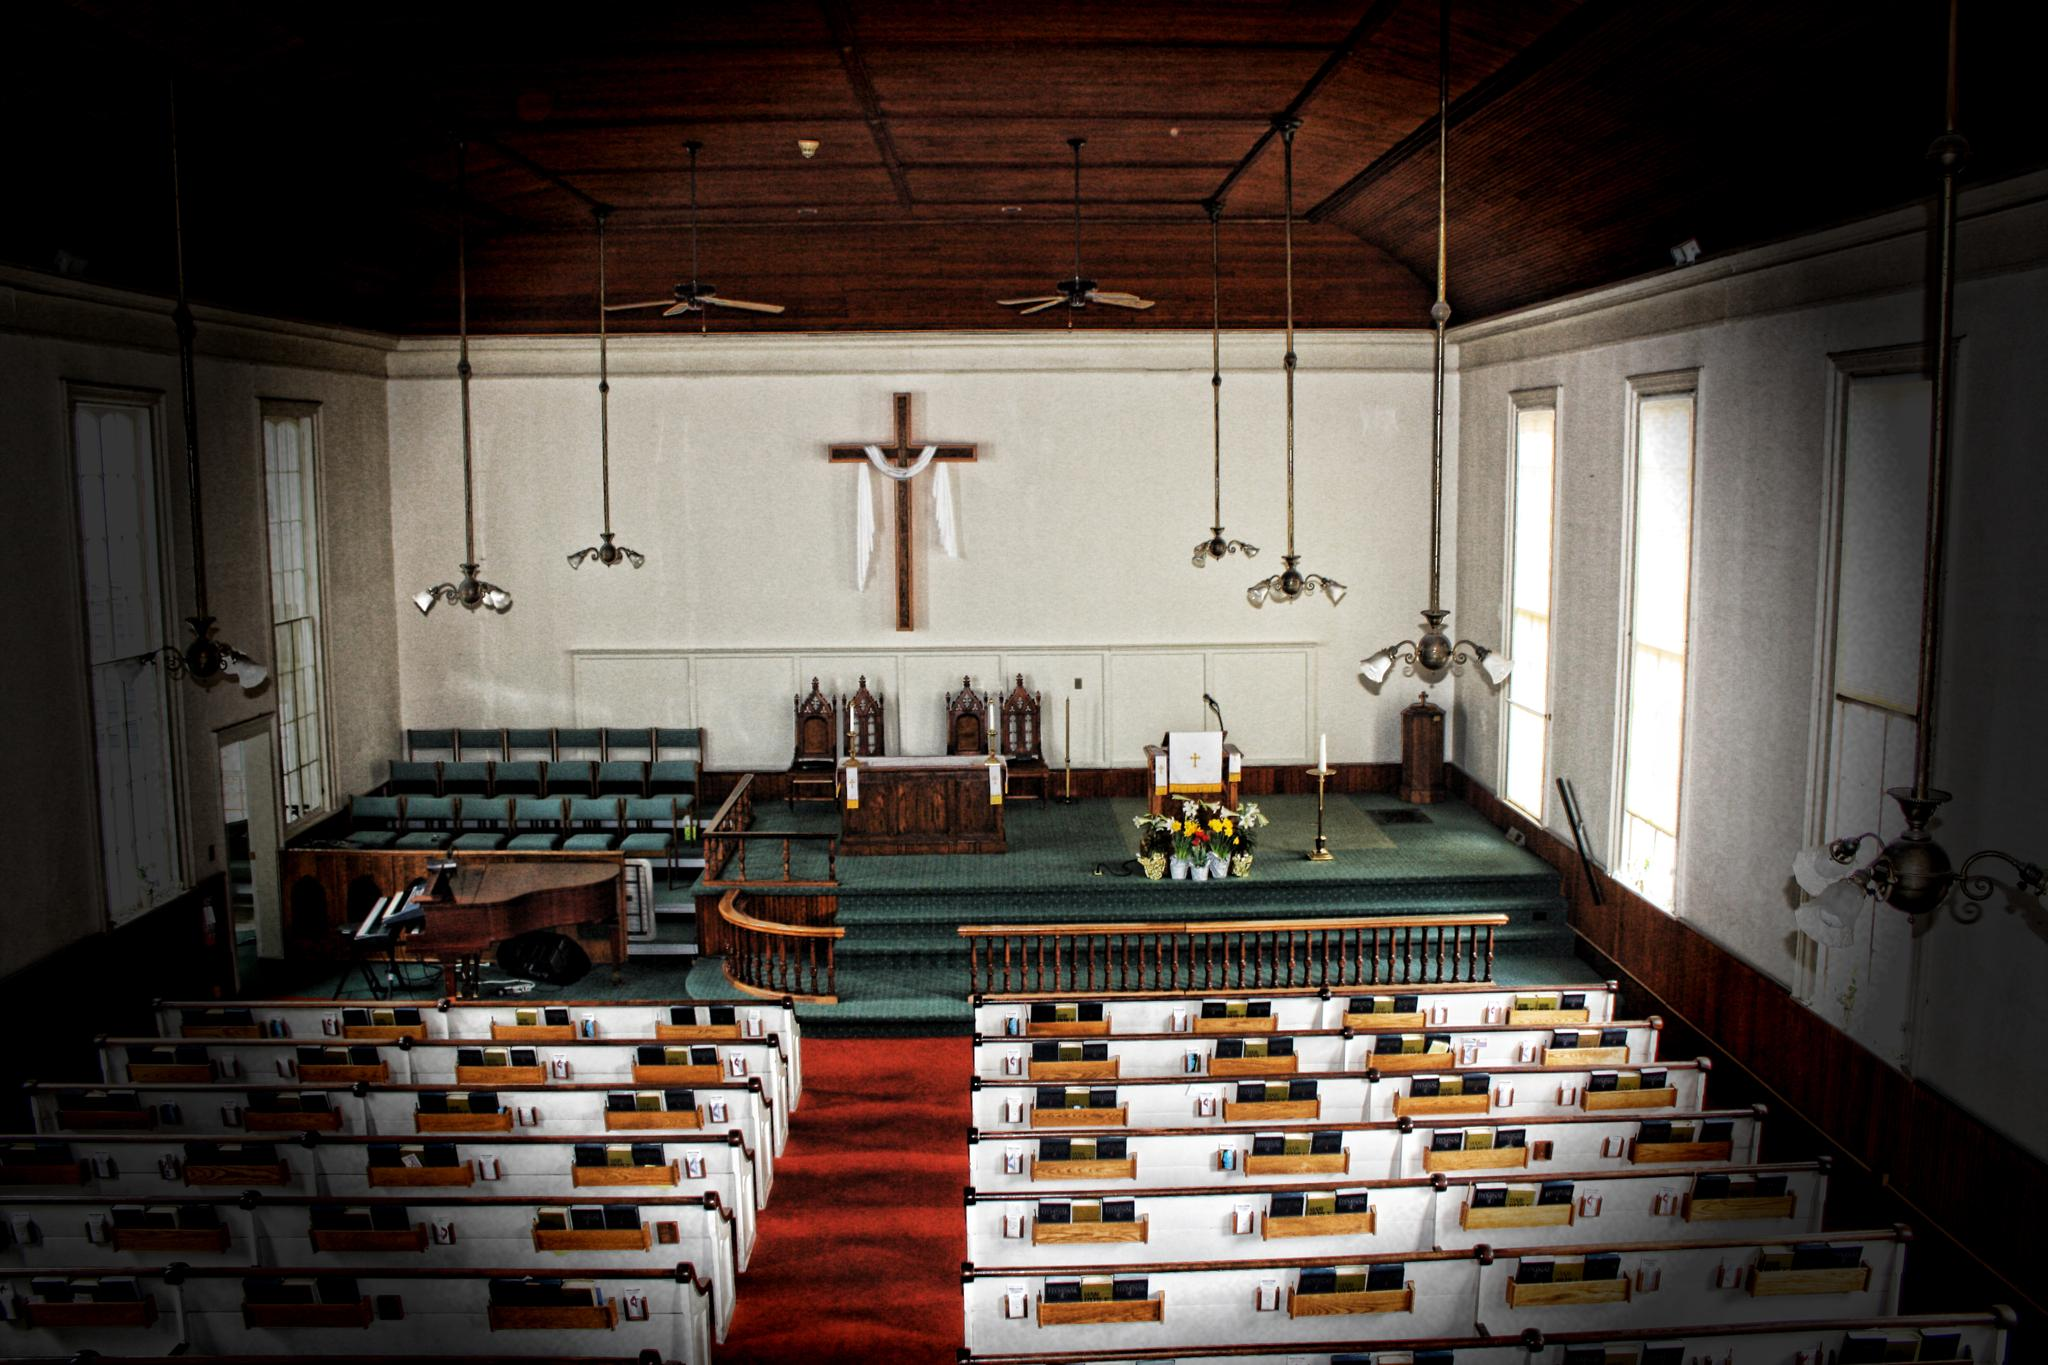 Woodbury United Methodist Church by todd.jimmo